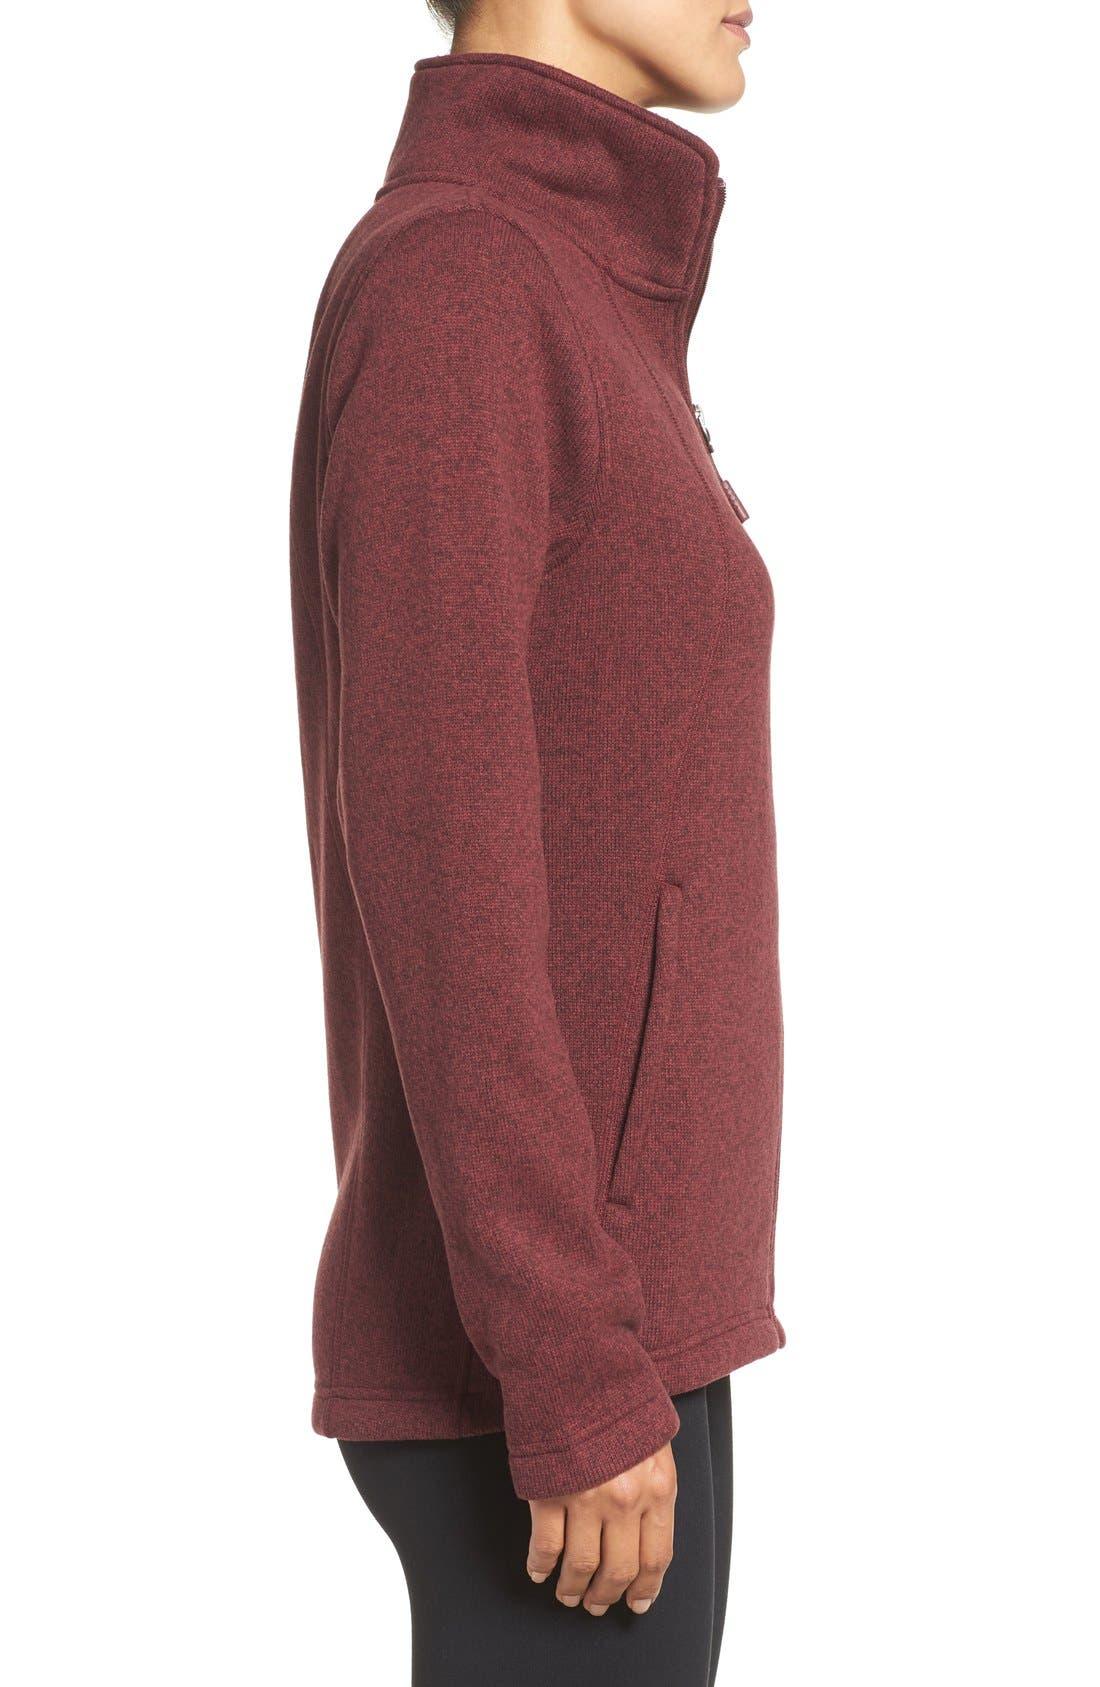 Alternate Image 3  - The North Face Crescent Fleece Jacket